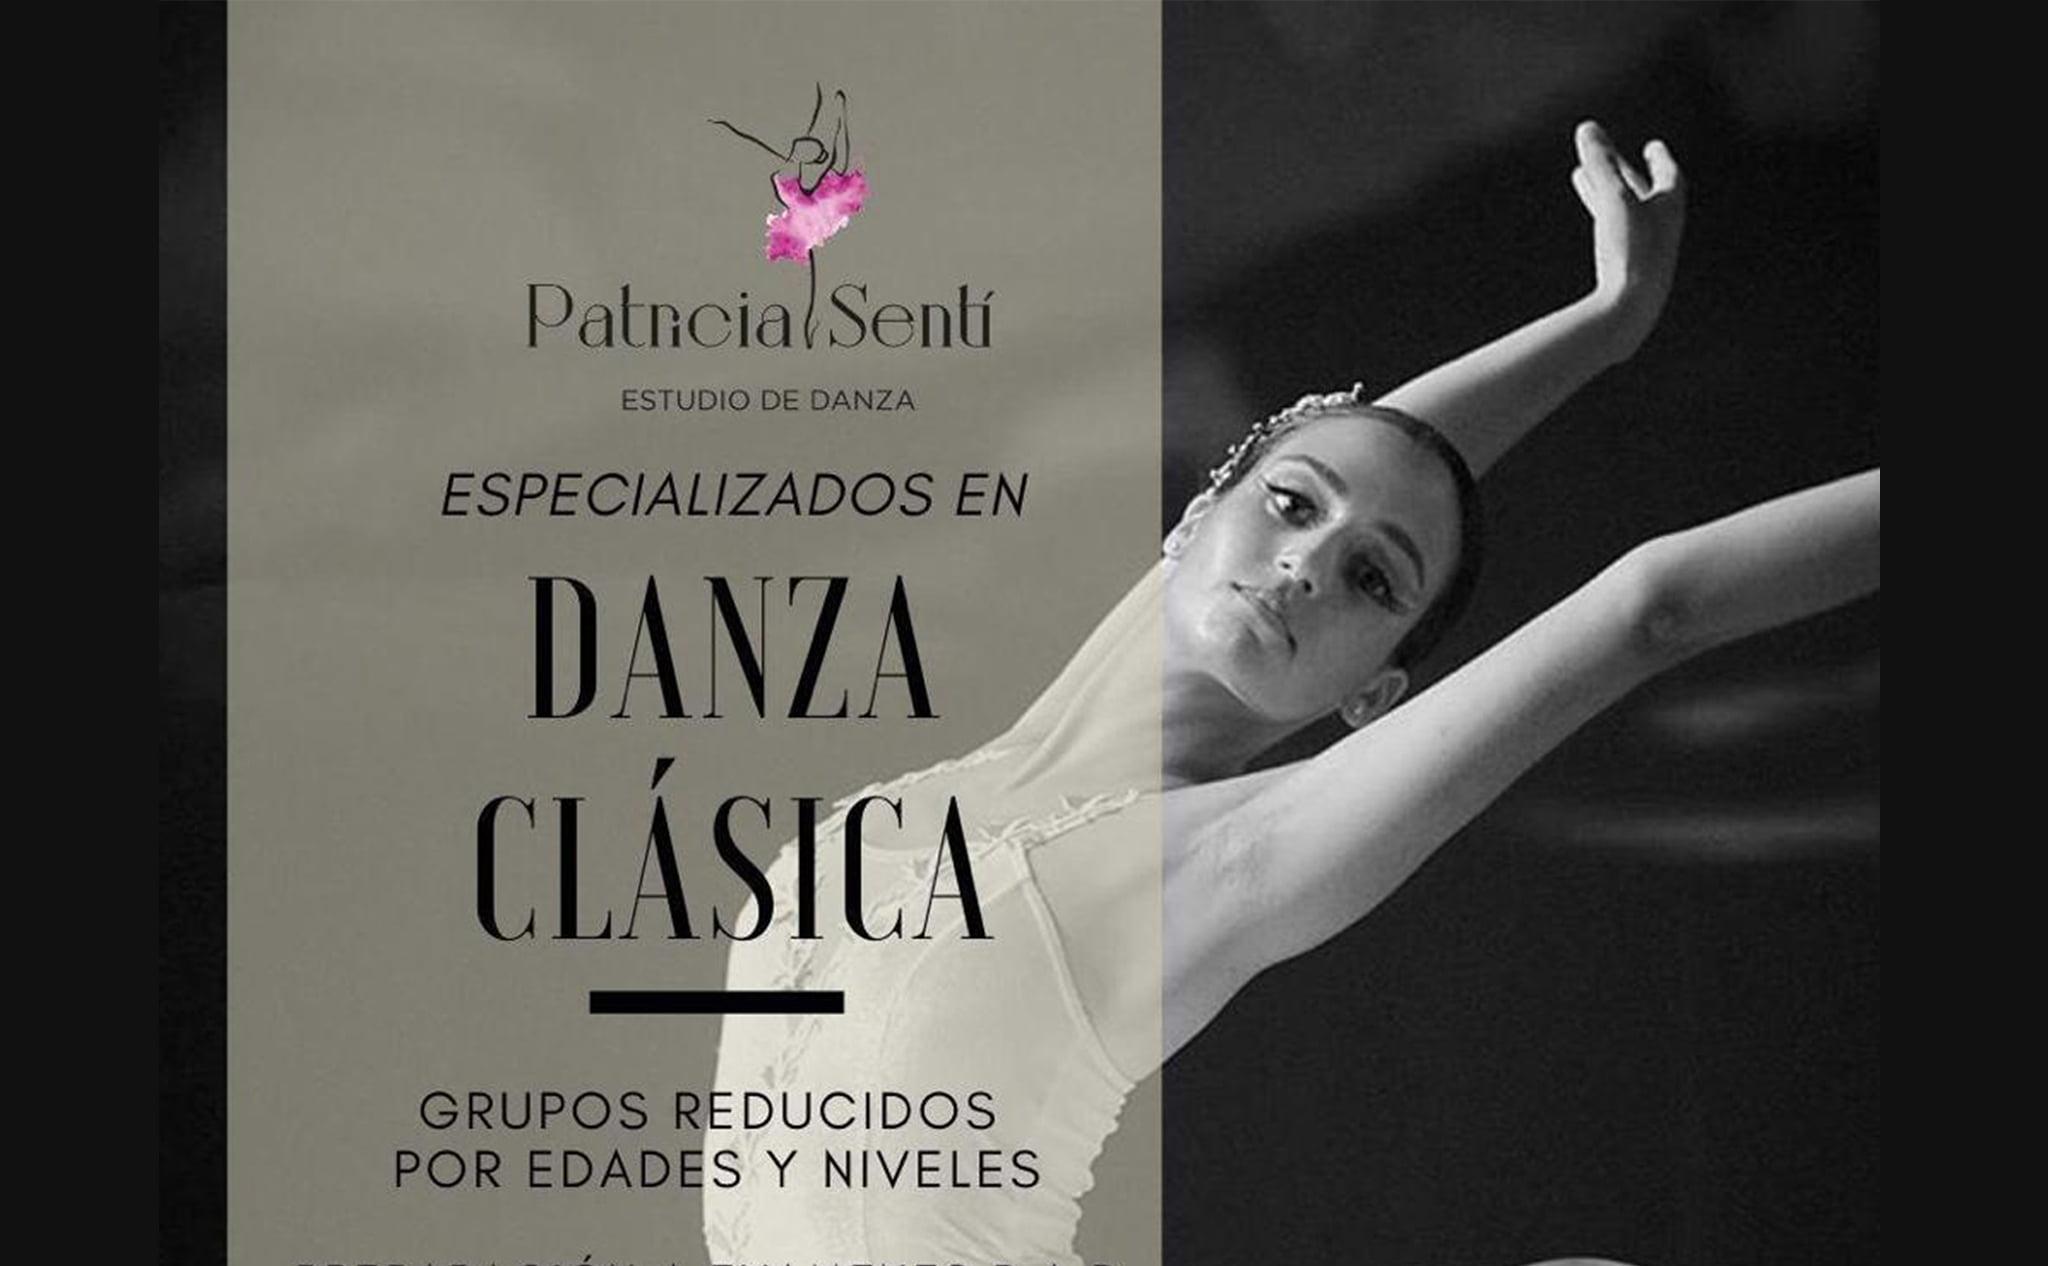 Classical dance in Dénia - Patricia Sentí Dance Studio